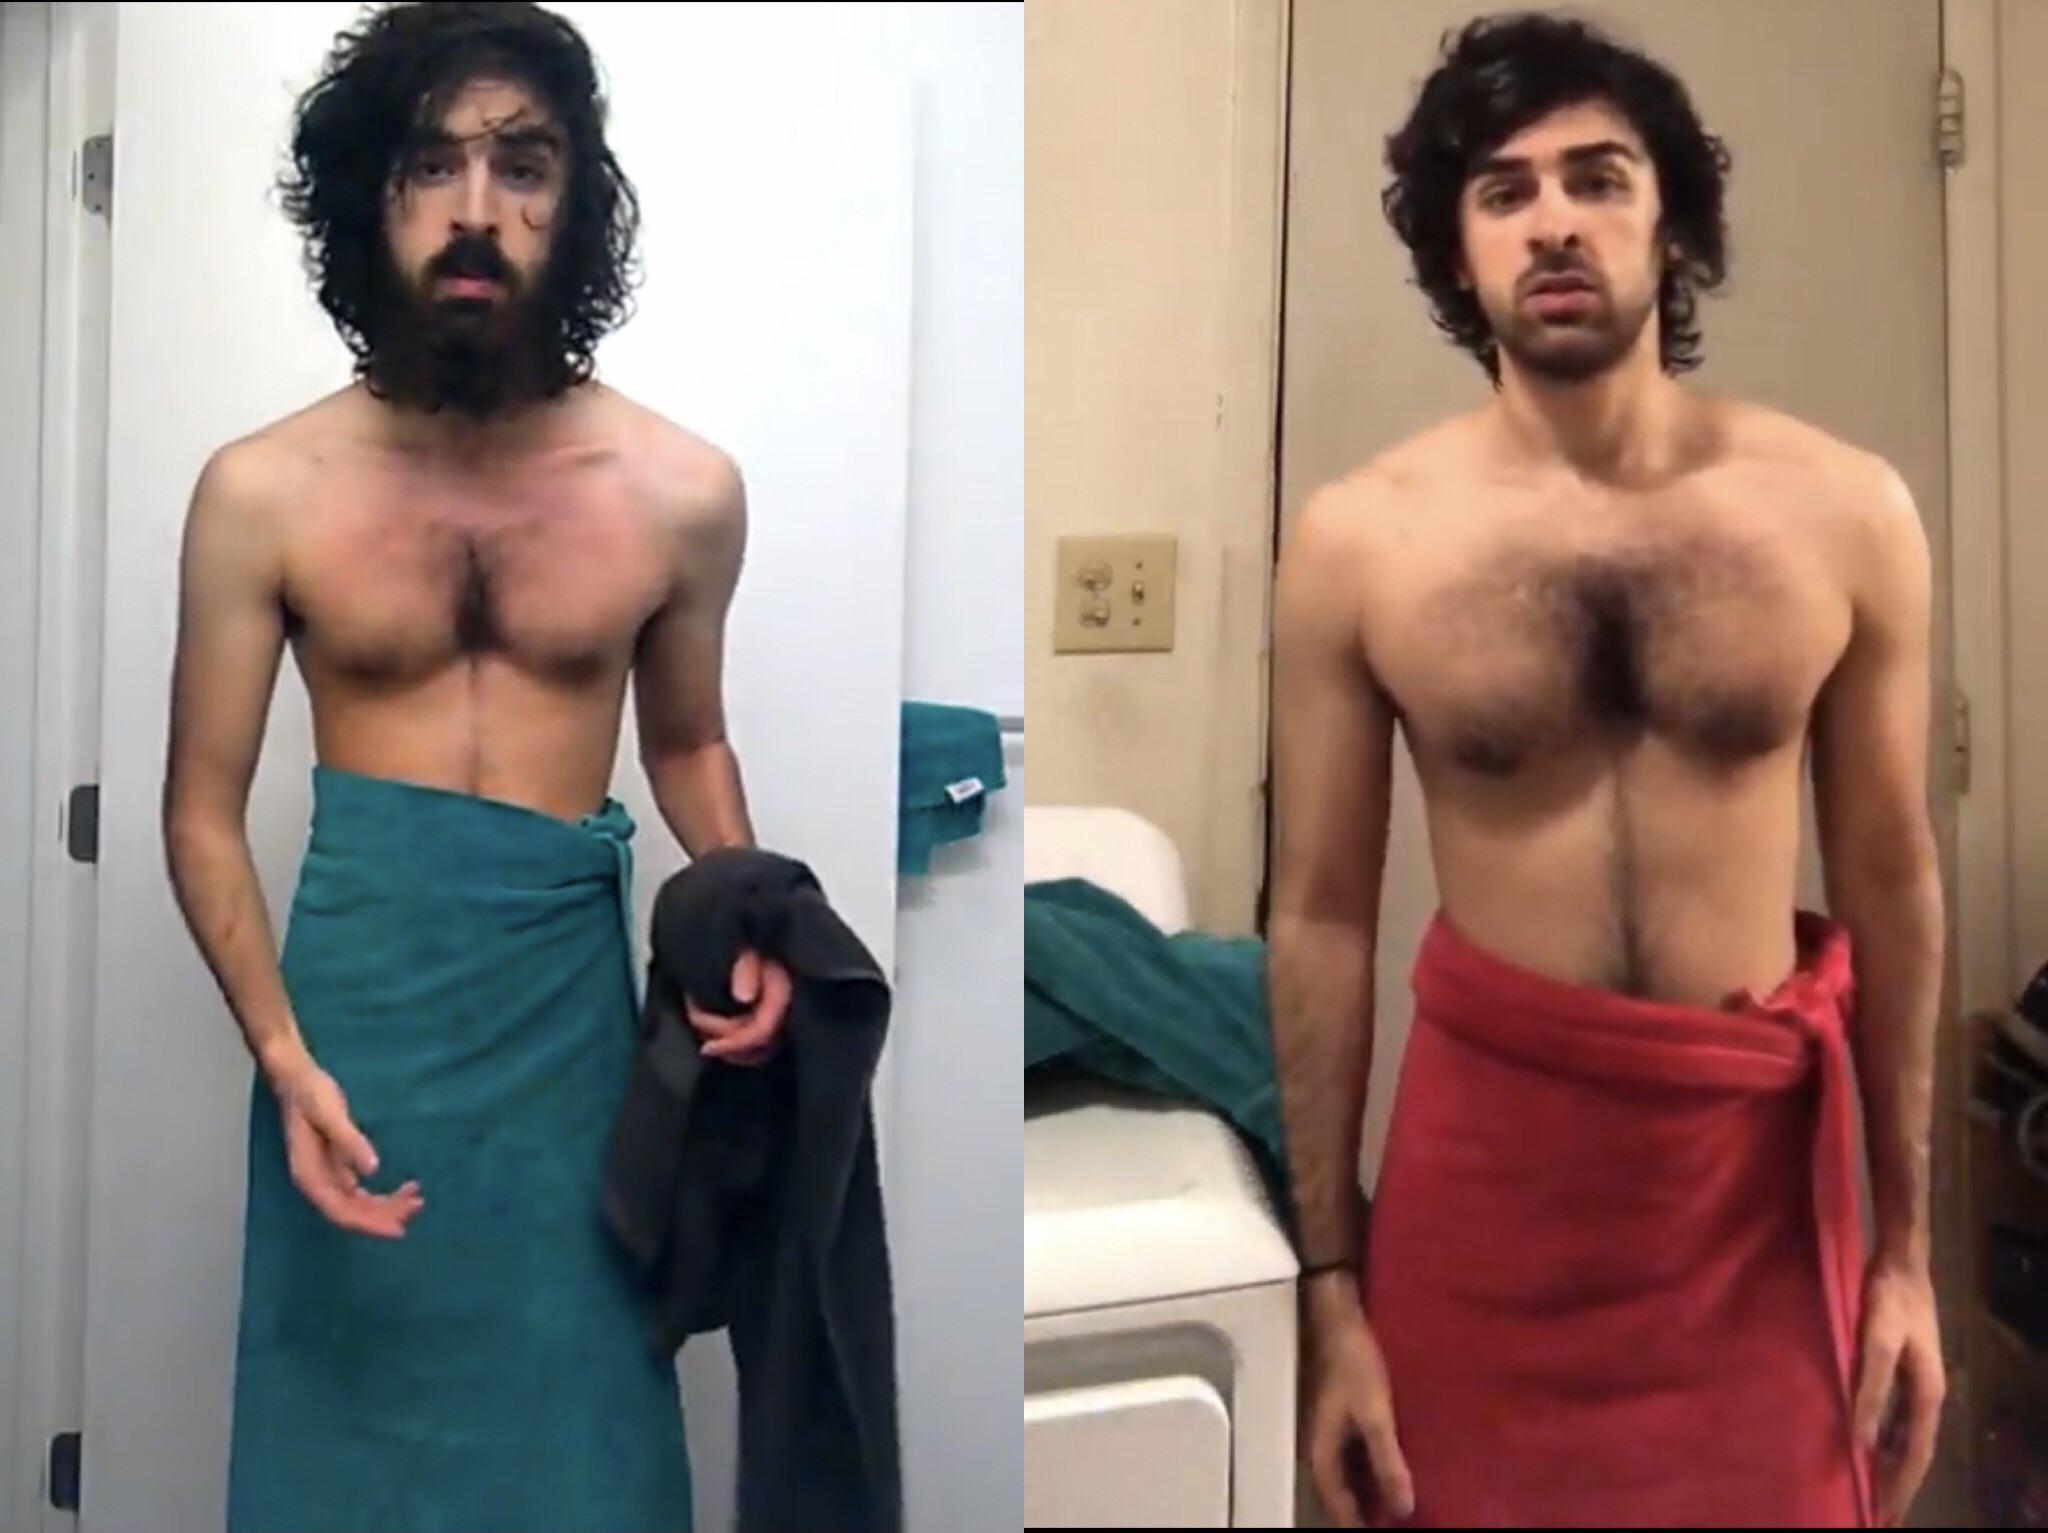 5'7 Male Progress Pics of 30 lbs Weight Gain 115 lbs to 145 lbs